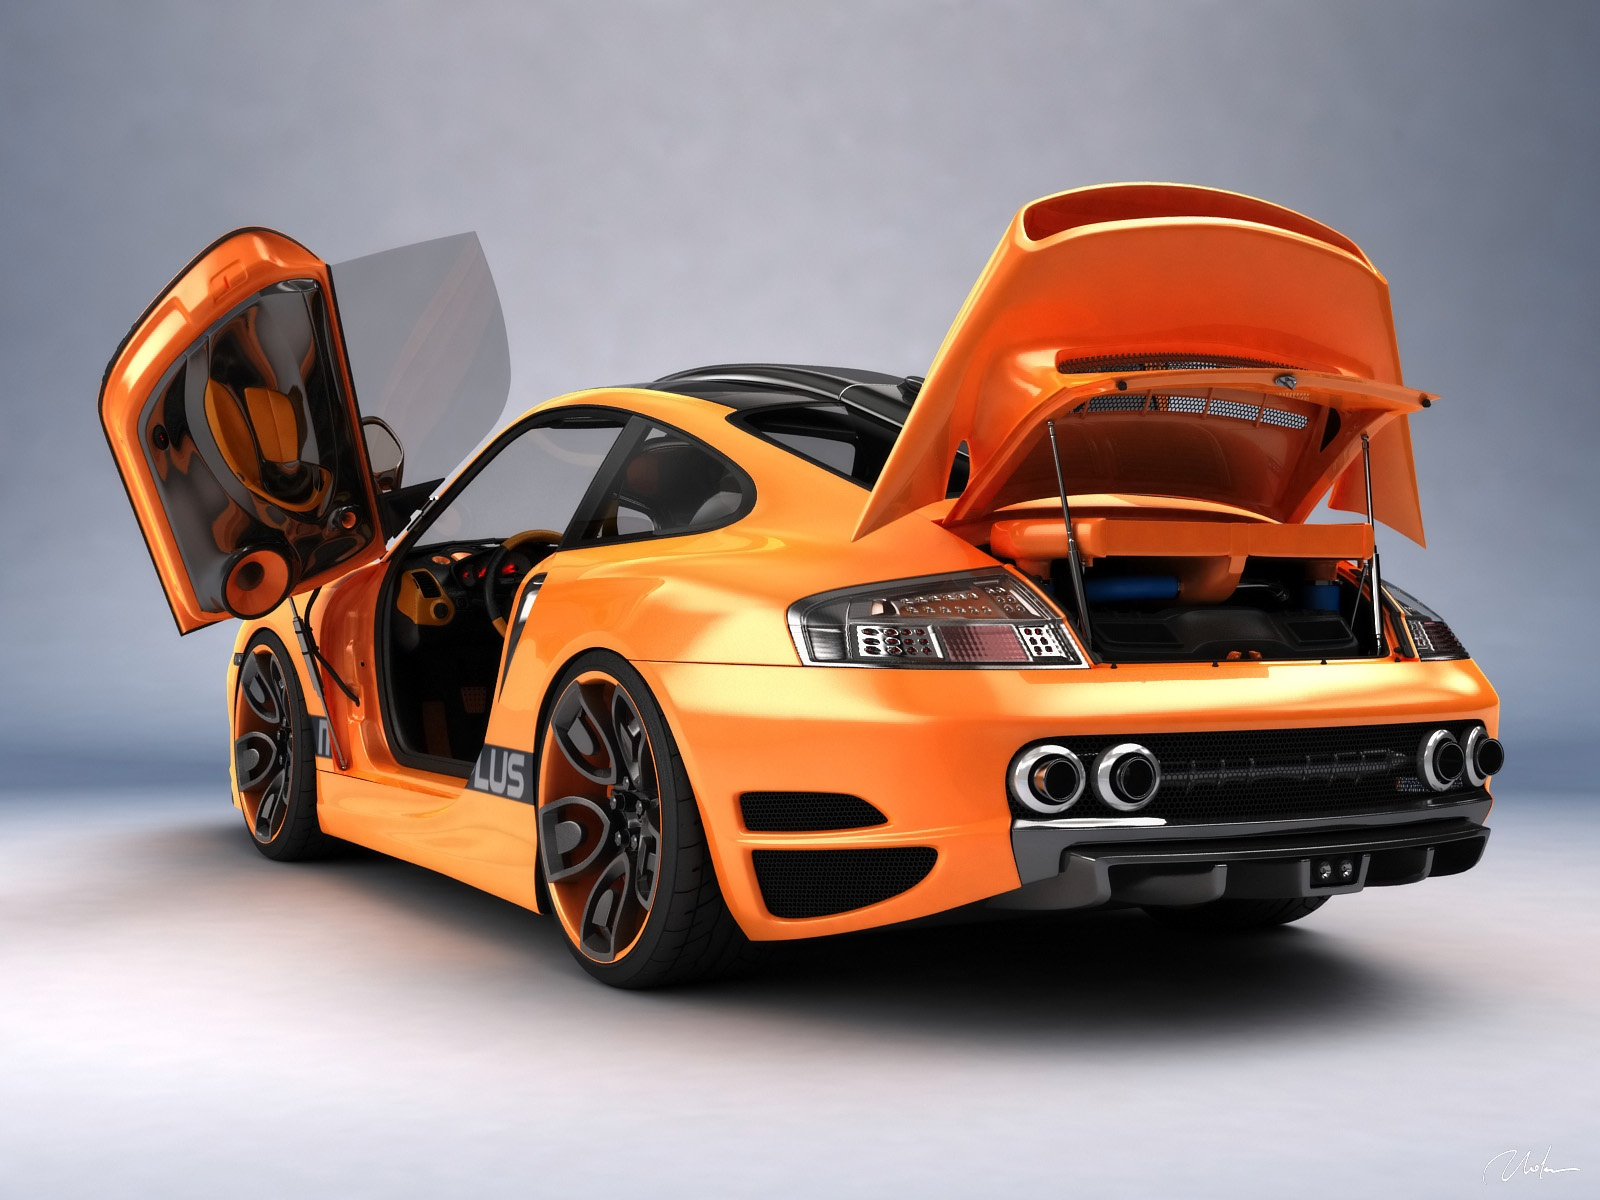 Wallpaper Orange Sports Car Close Up 1600x1200 Hd Picture Image